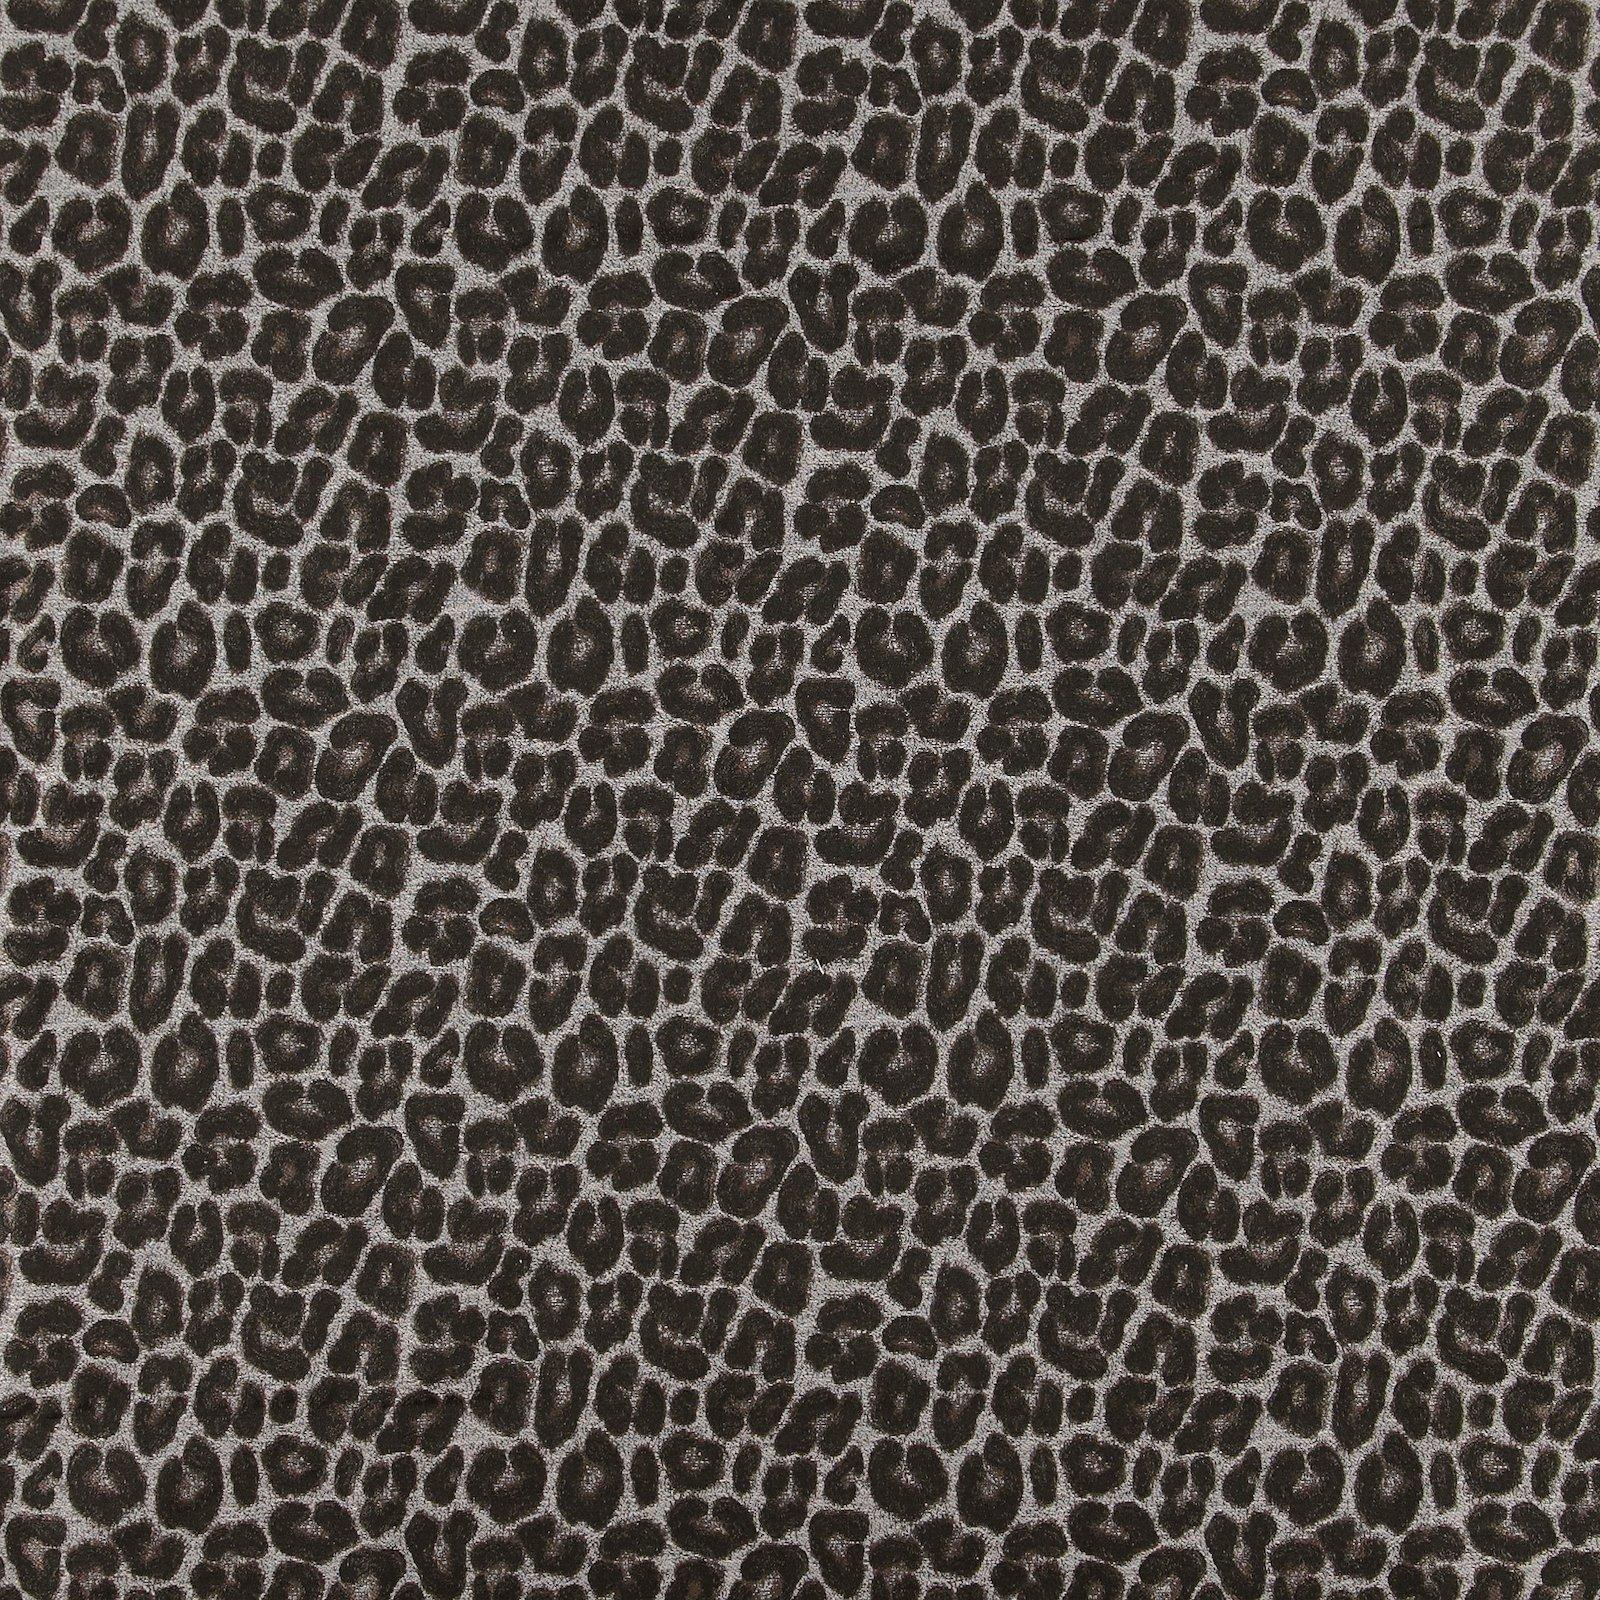 Jacquard grey w black/brown leo pattern 803732_pack_sp